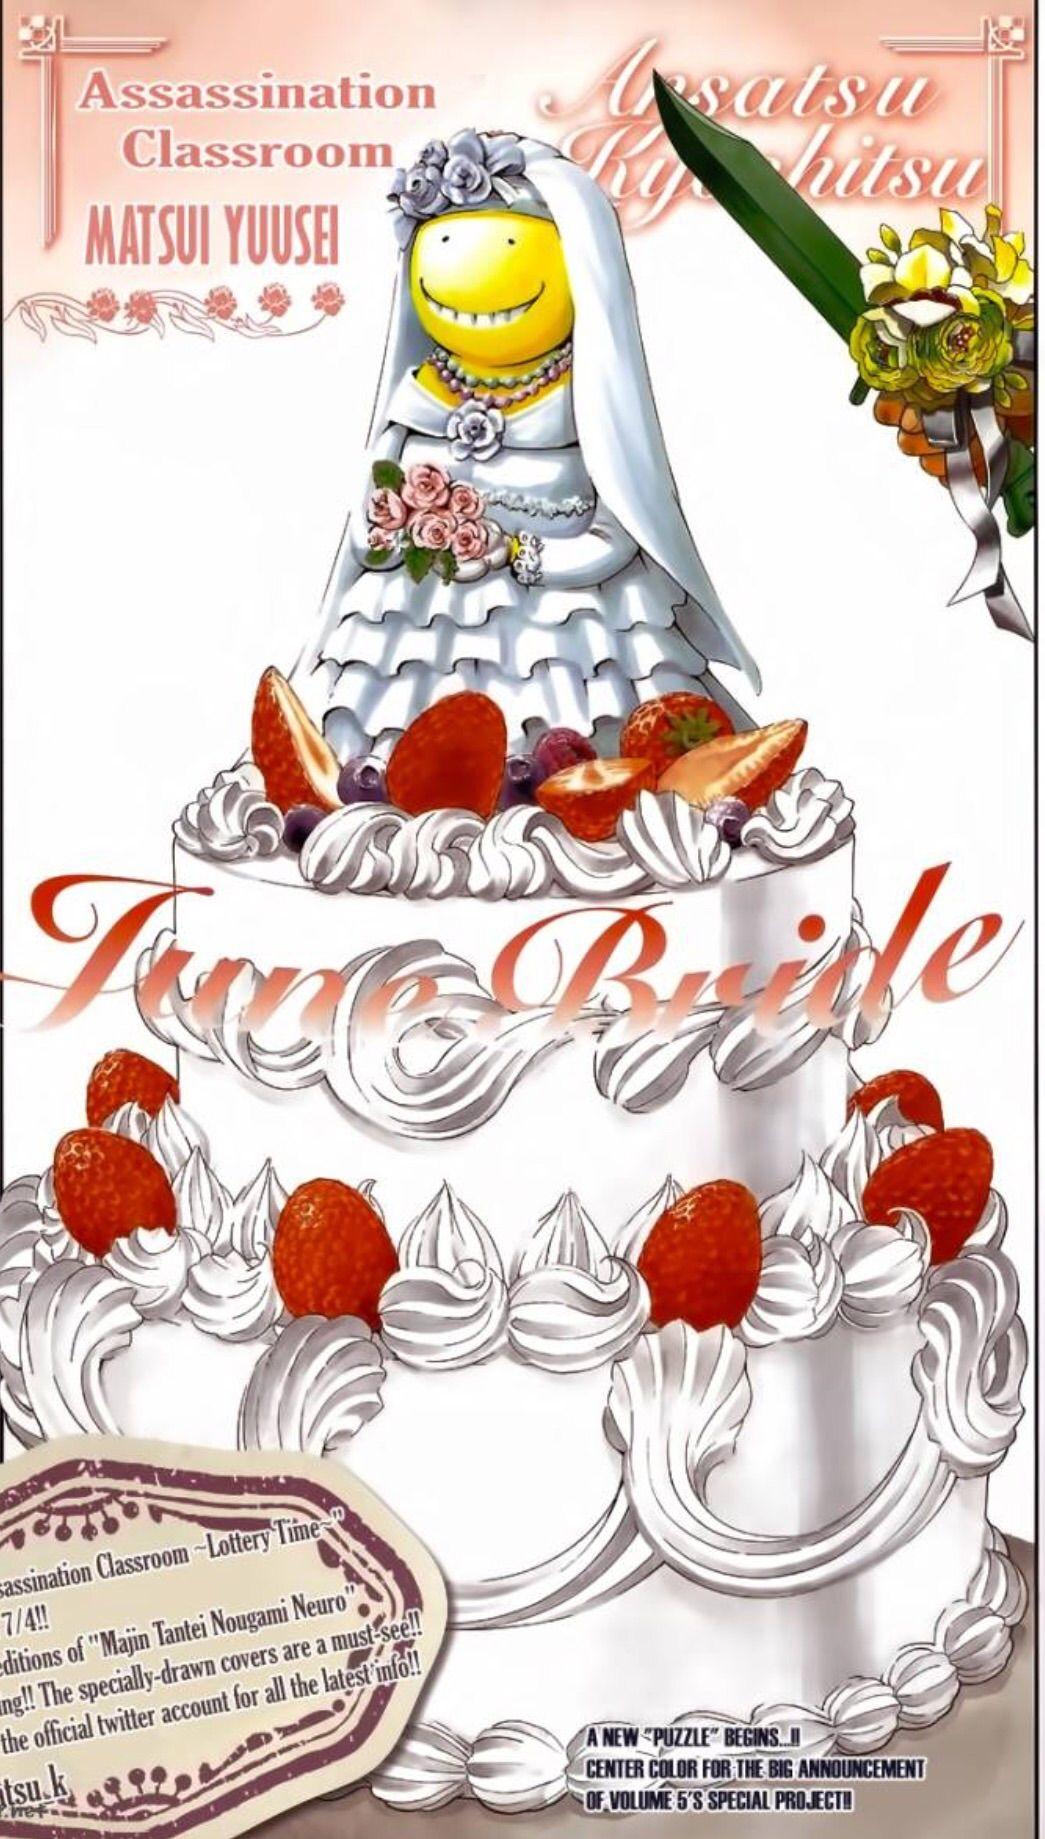 June bride.....     What the hell koro-sensei??!!